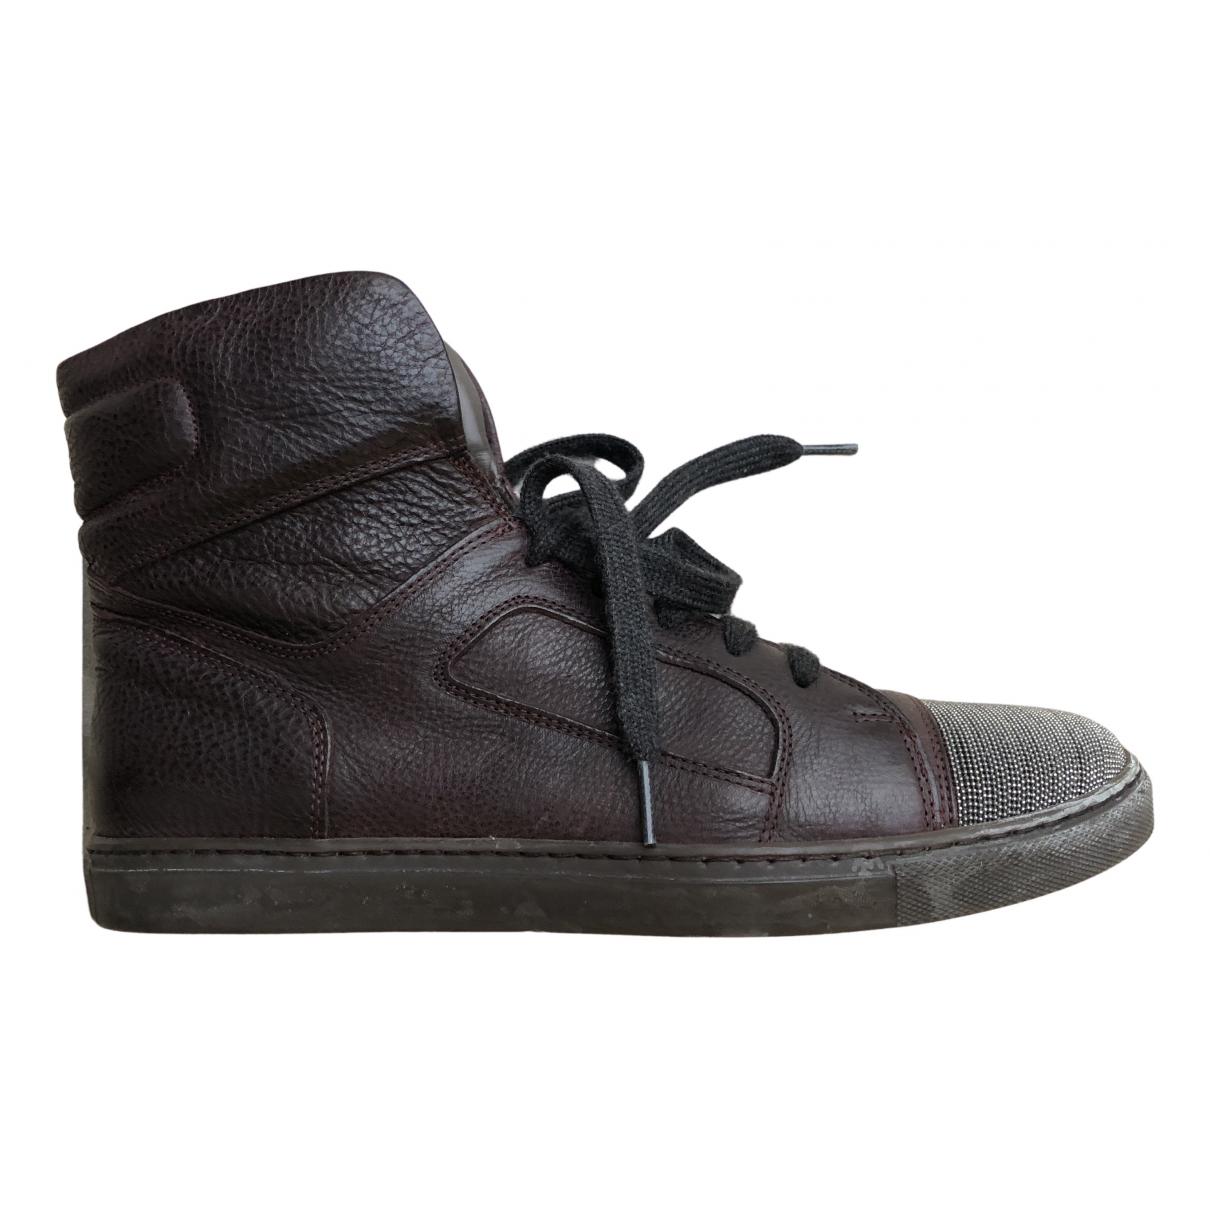 Brunello Cucinelli \N Sneakers in  Braun Leder